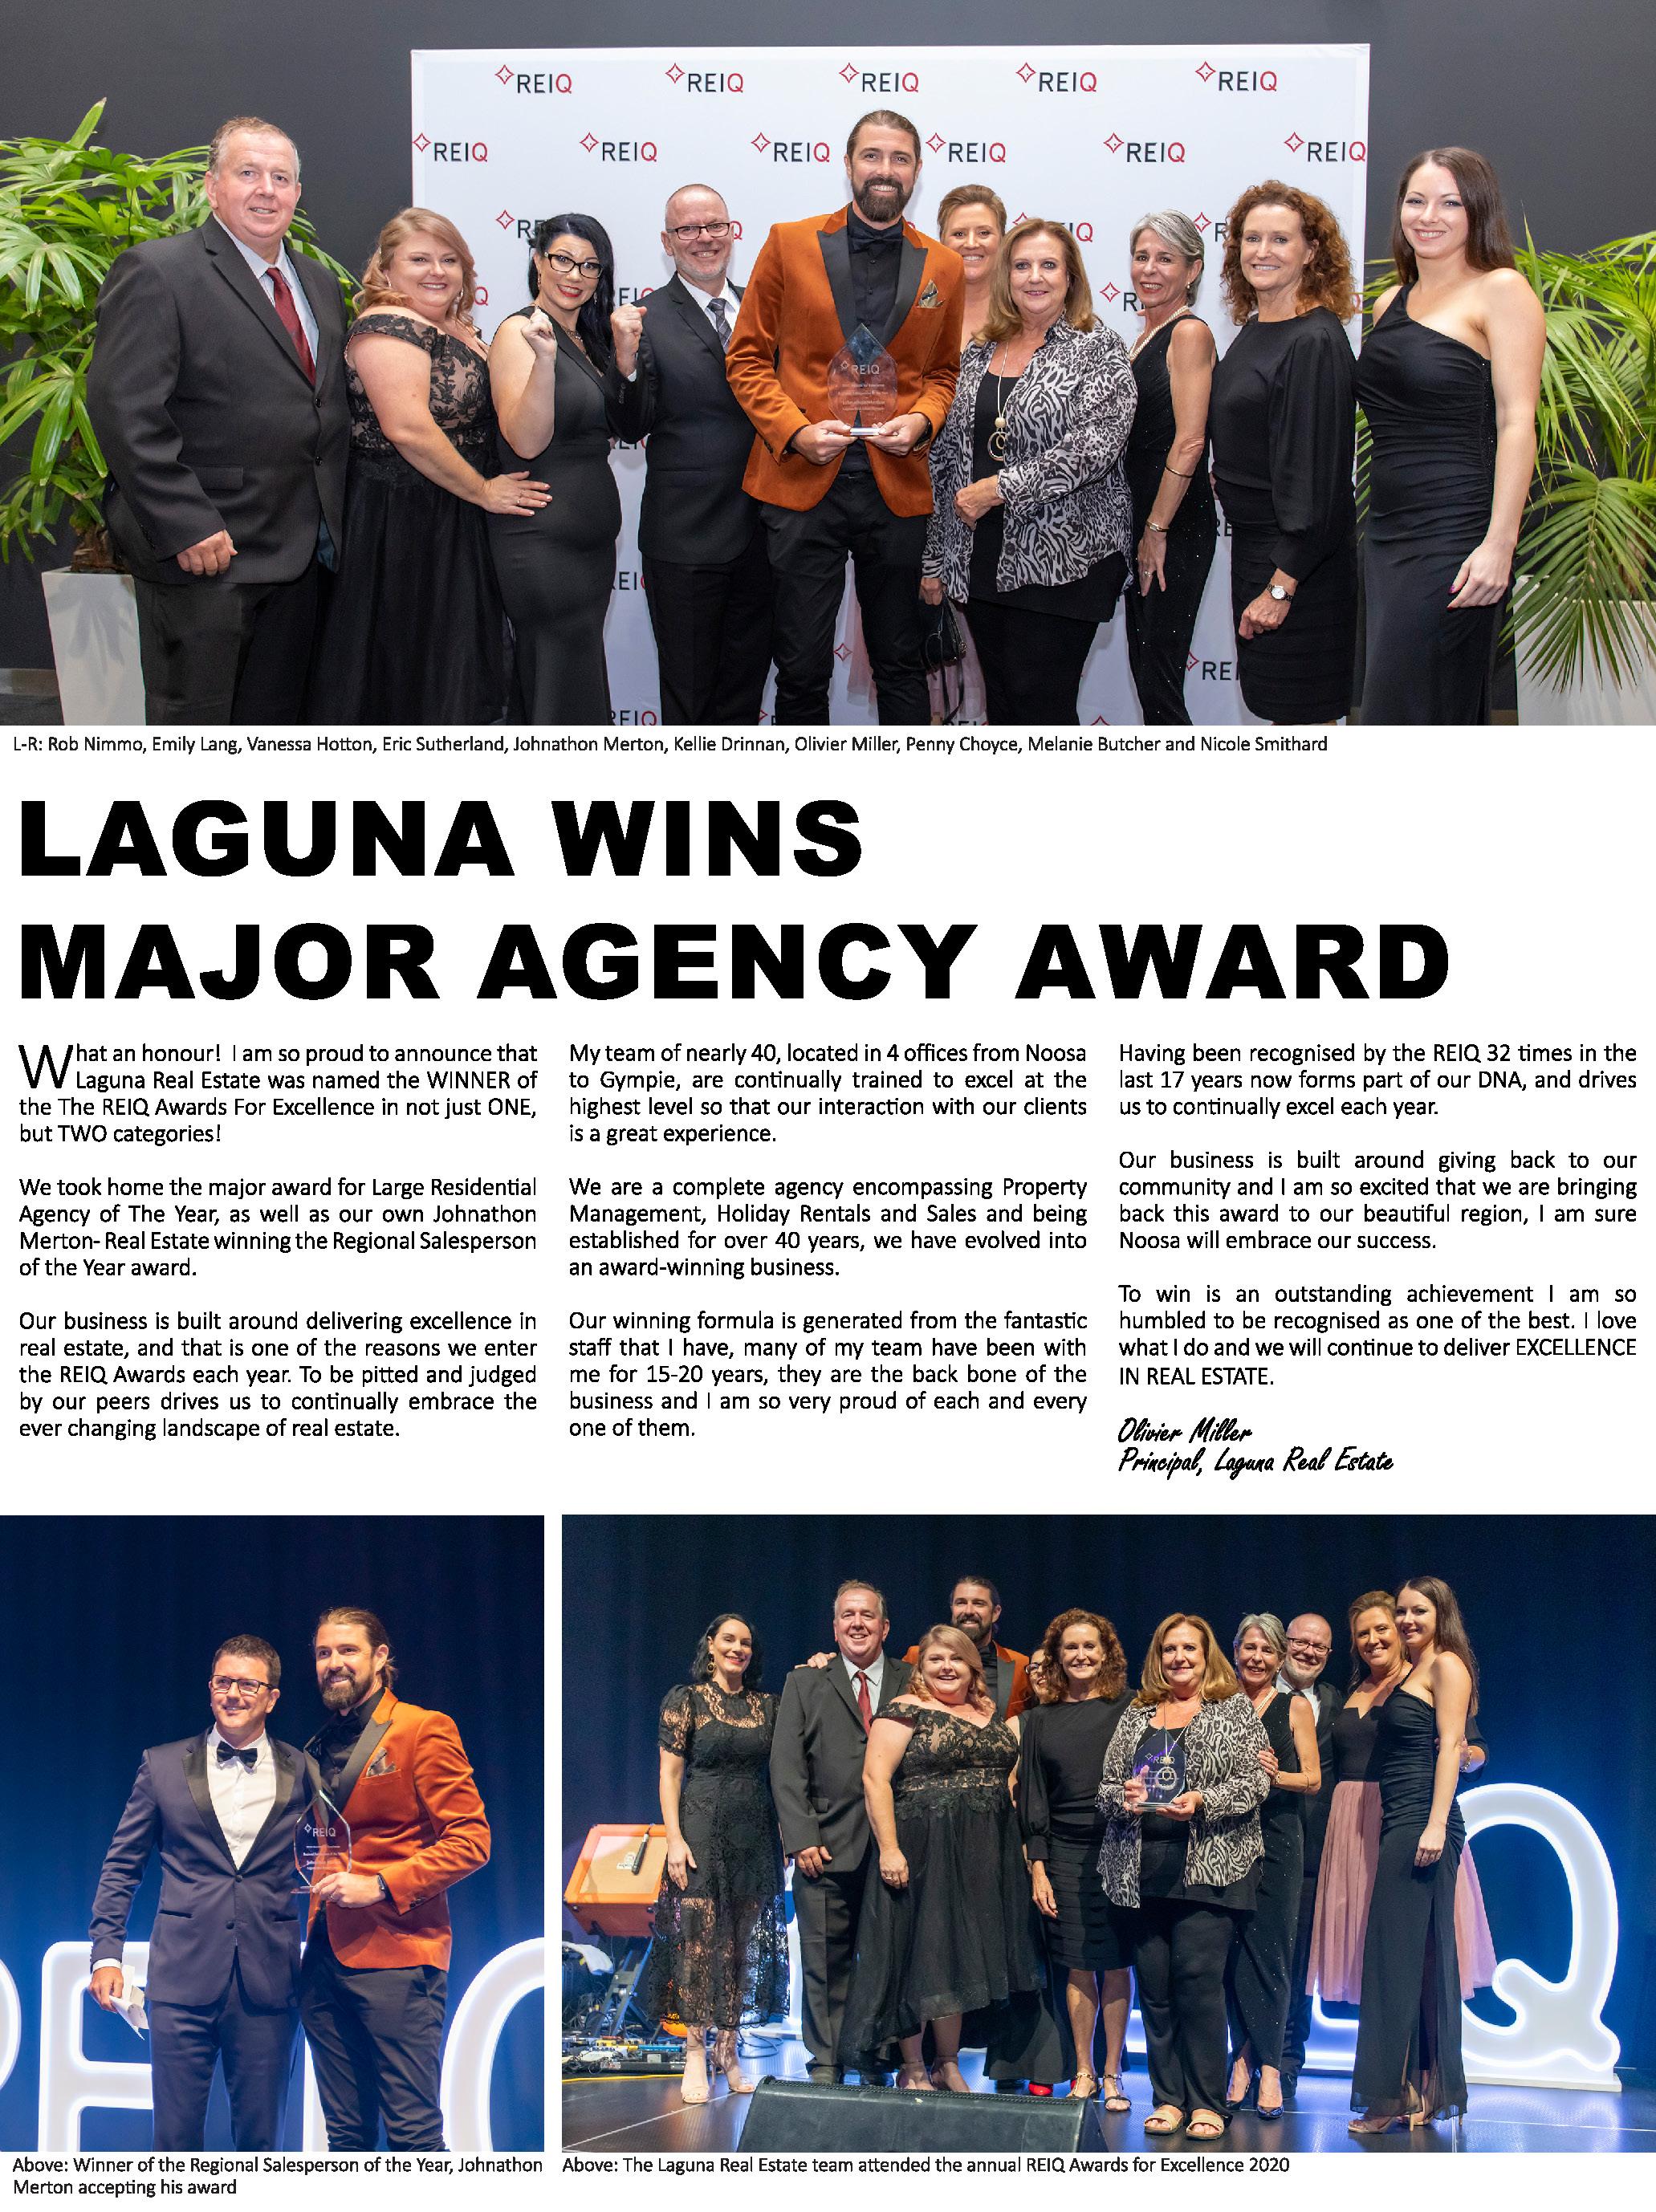 https://assets.boxdice.com.au/laguna/attachments/223/f9b/reiq_awards_promo_tuesday_240320_headers.jpg?946ea0318941c7a143ee770ad0d19d90